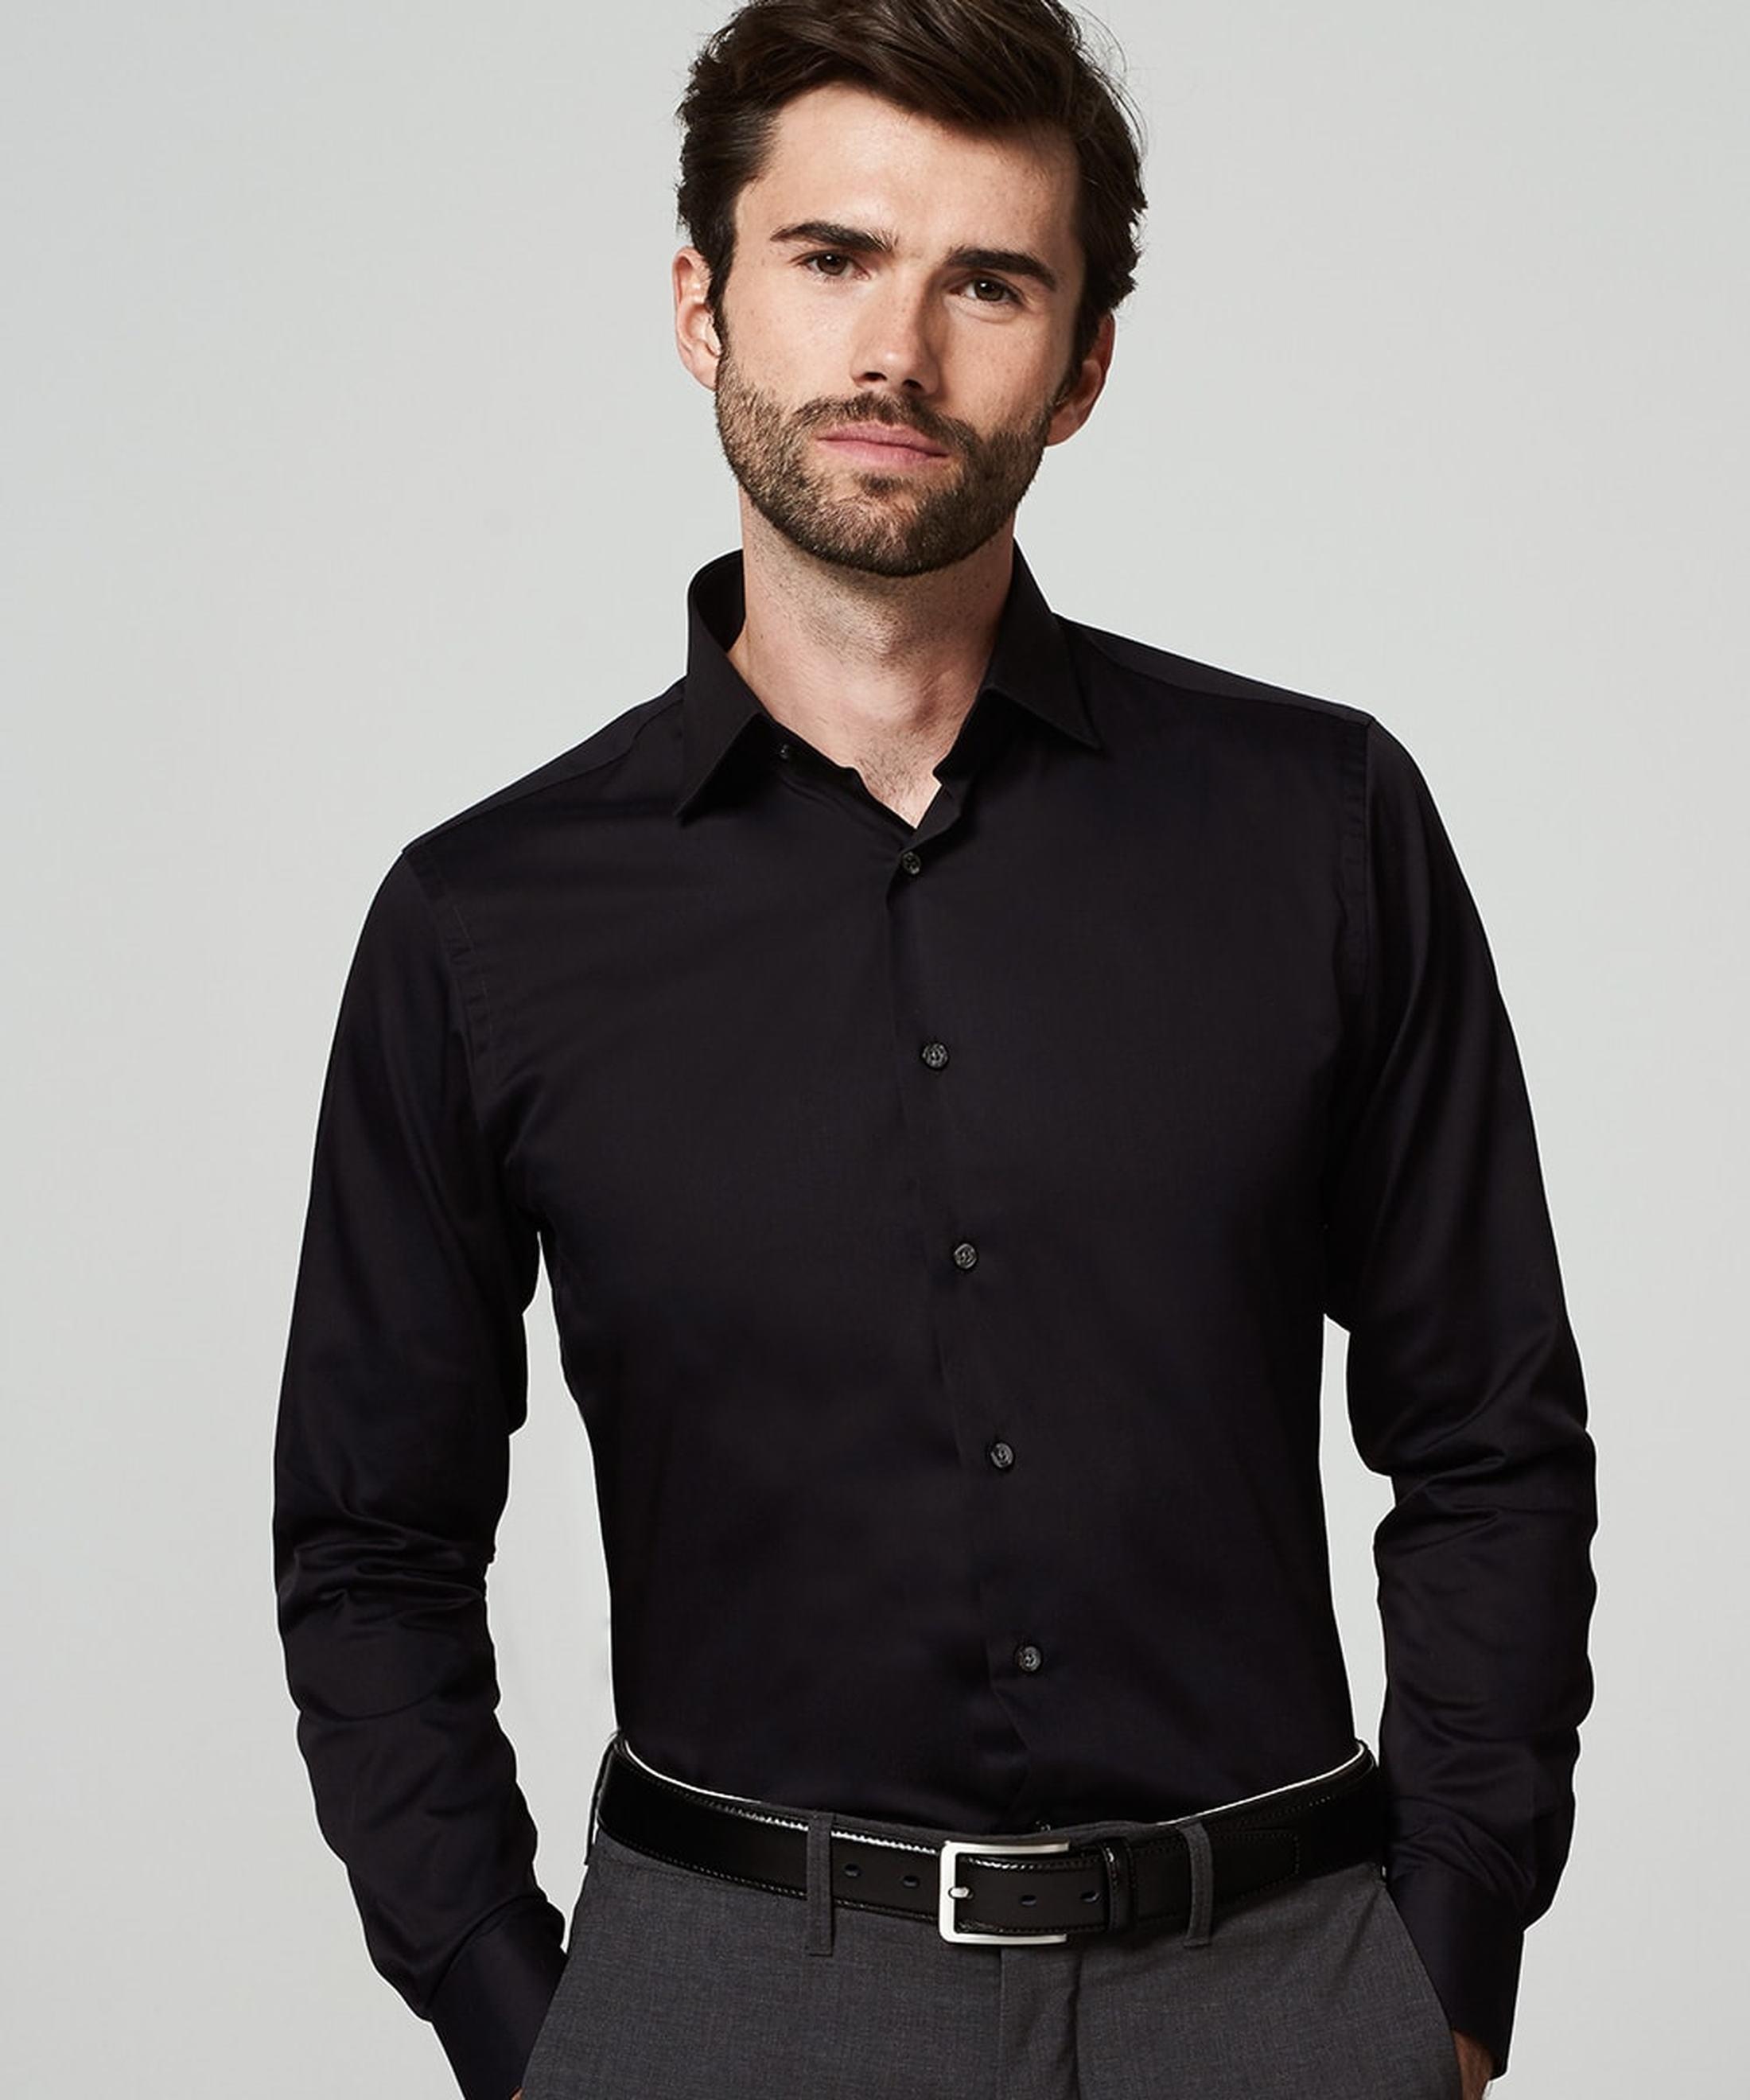 Michaelis Overhemd Zwart SL7 foto 4